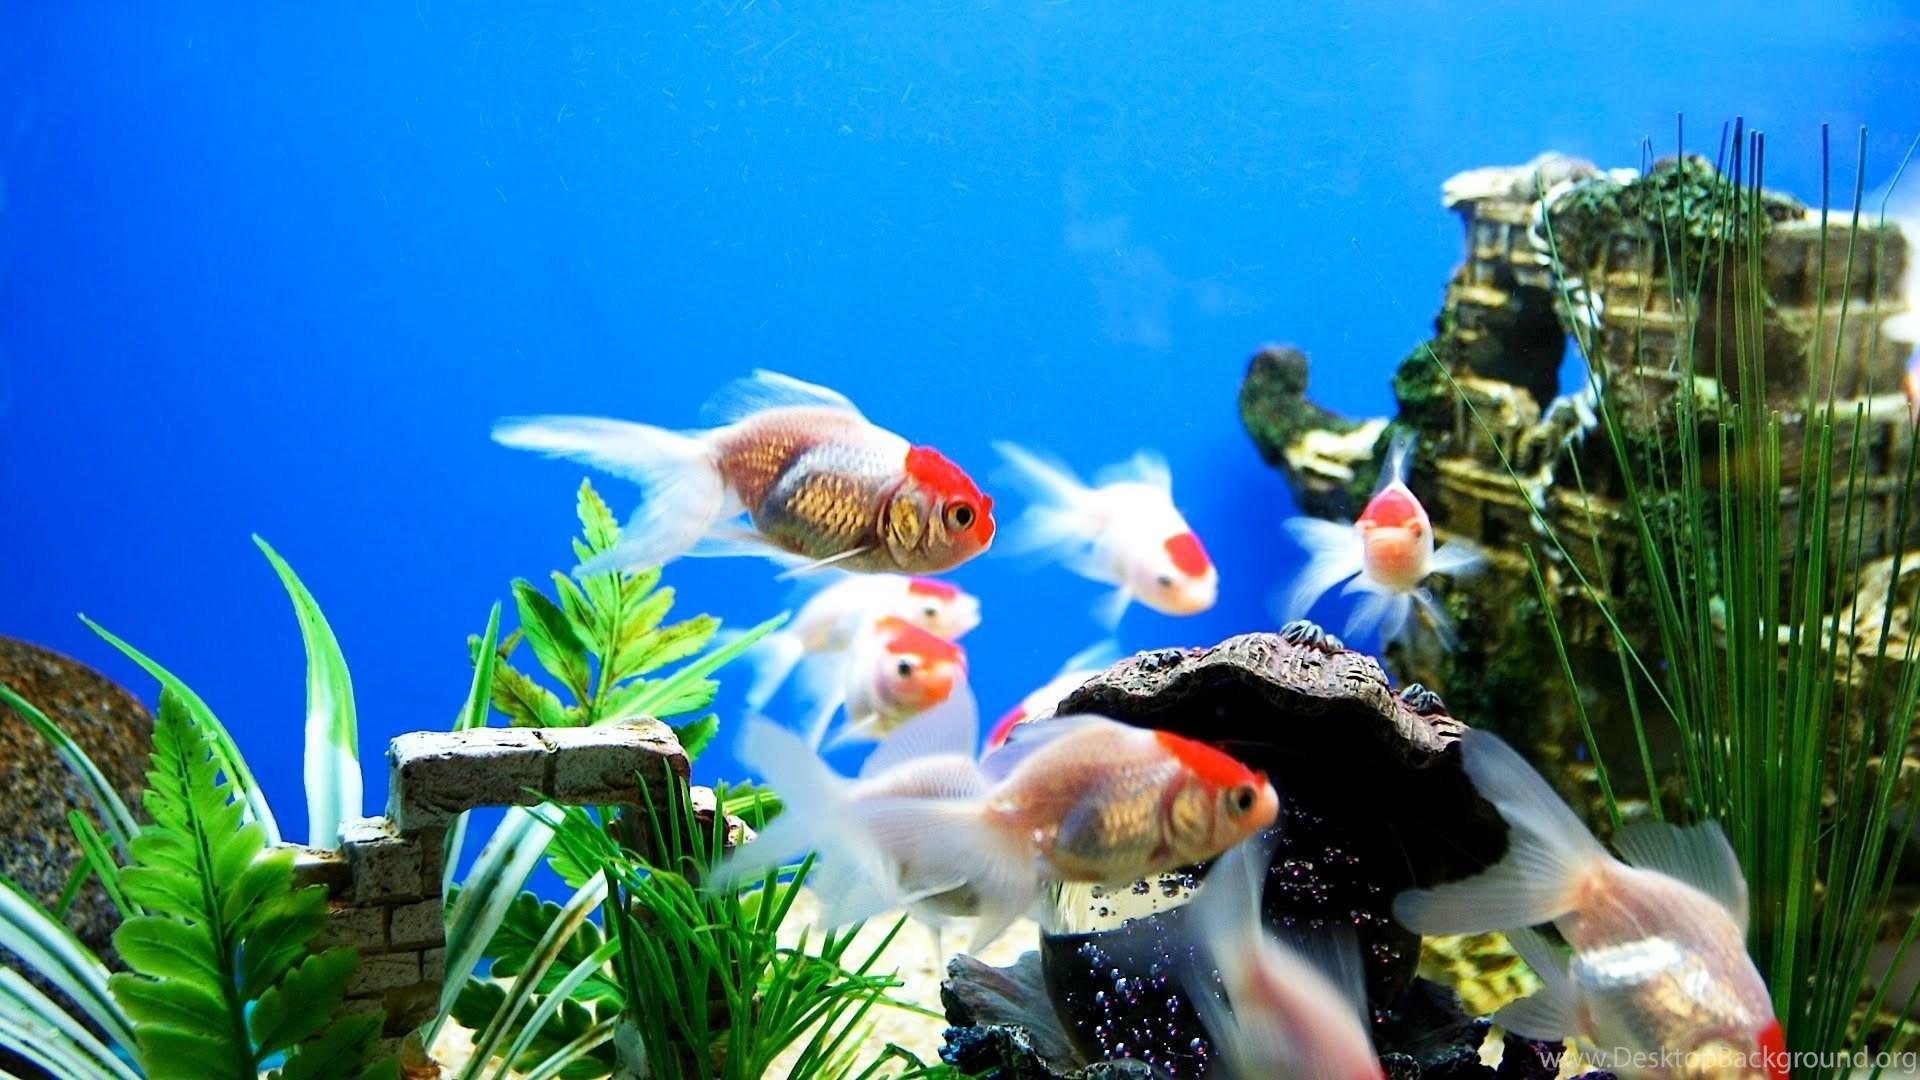 Fish Tank Free Hd Wallpapers Desktop Background